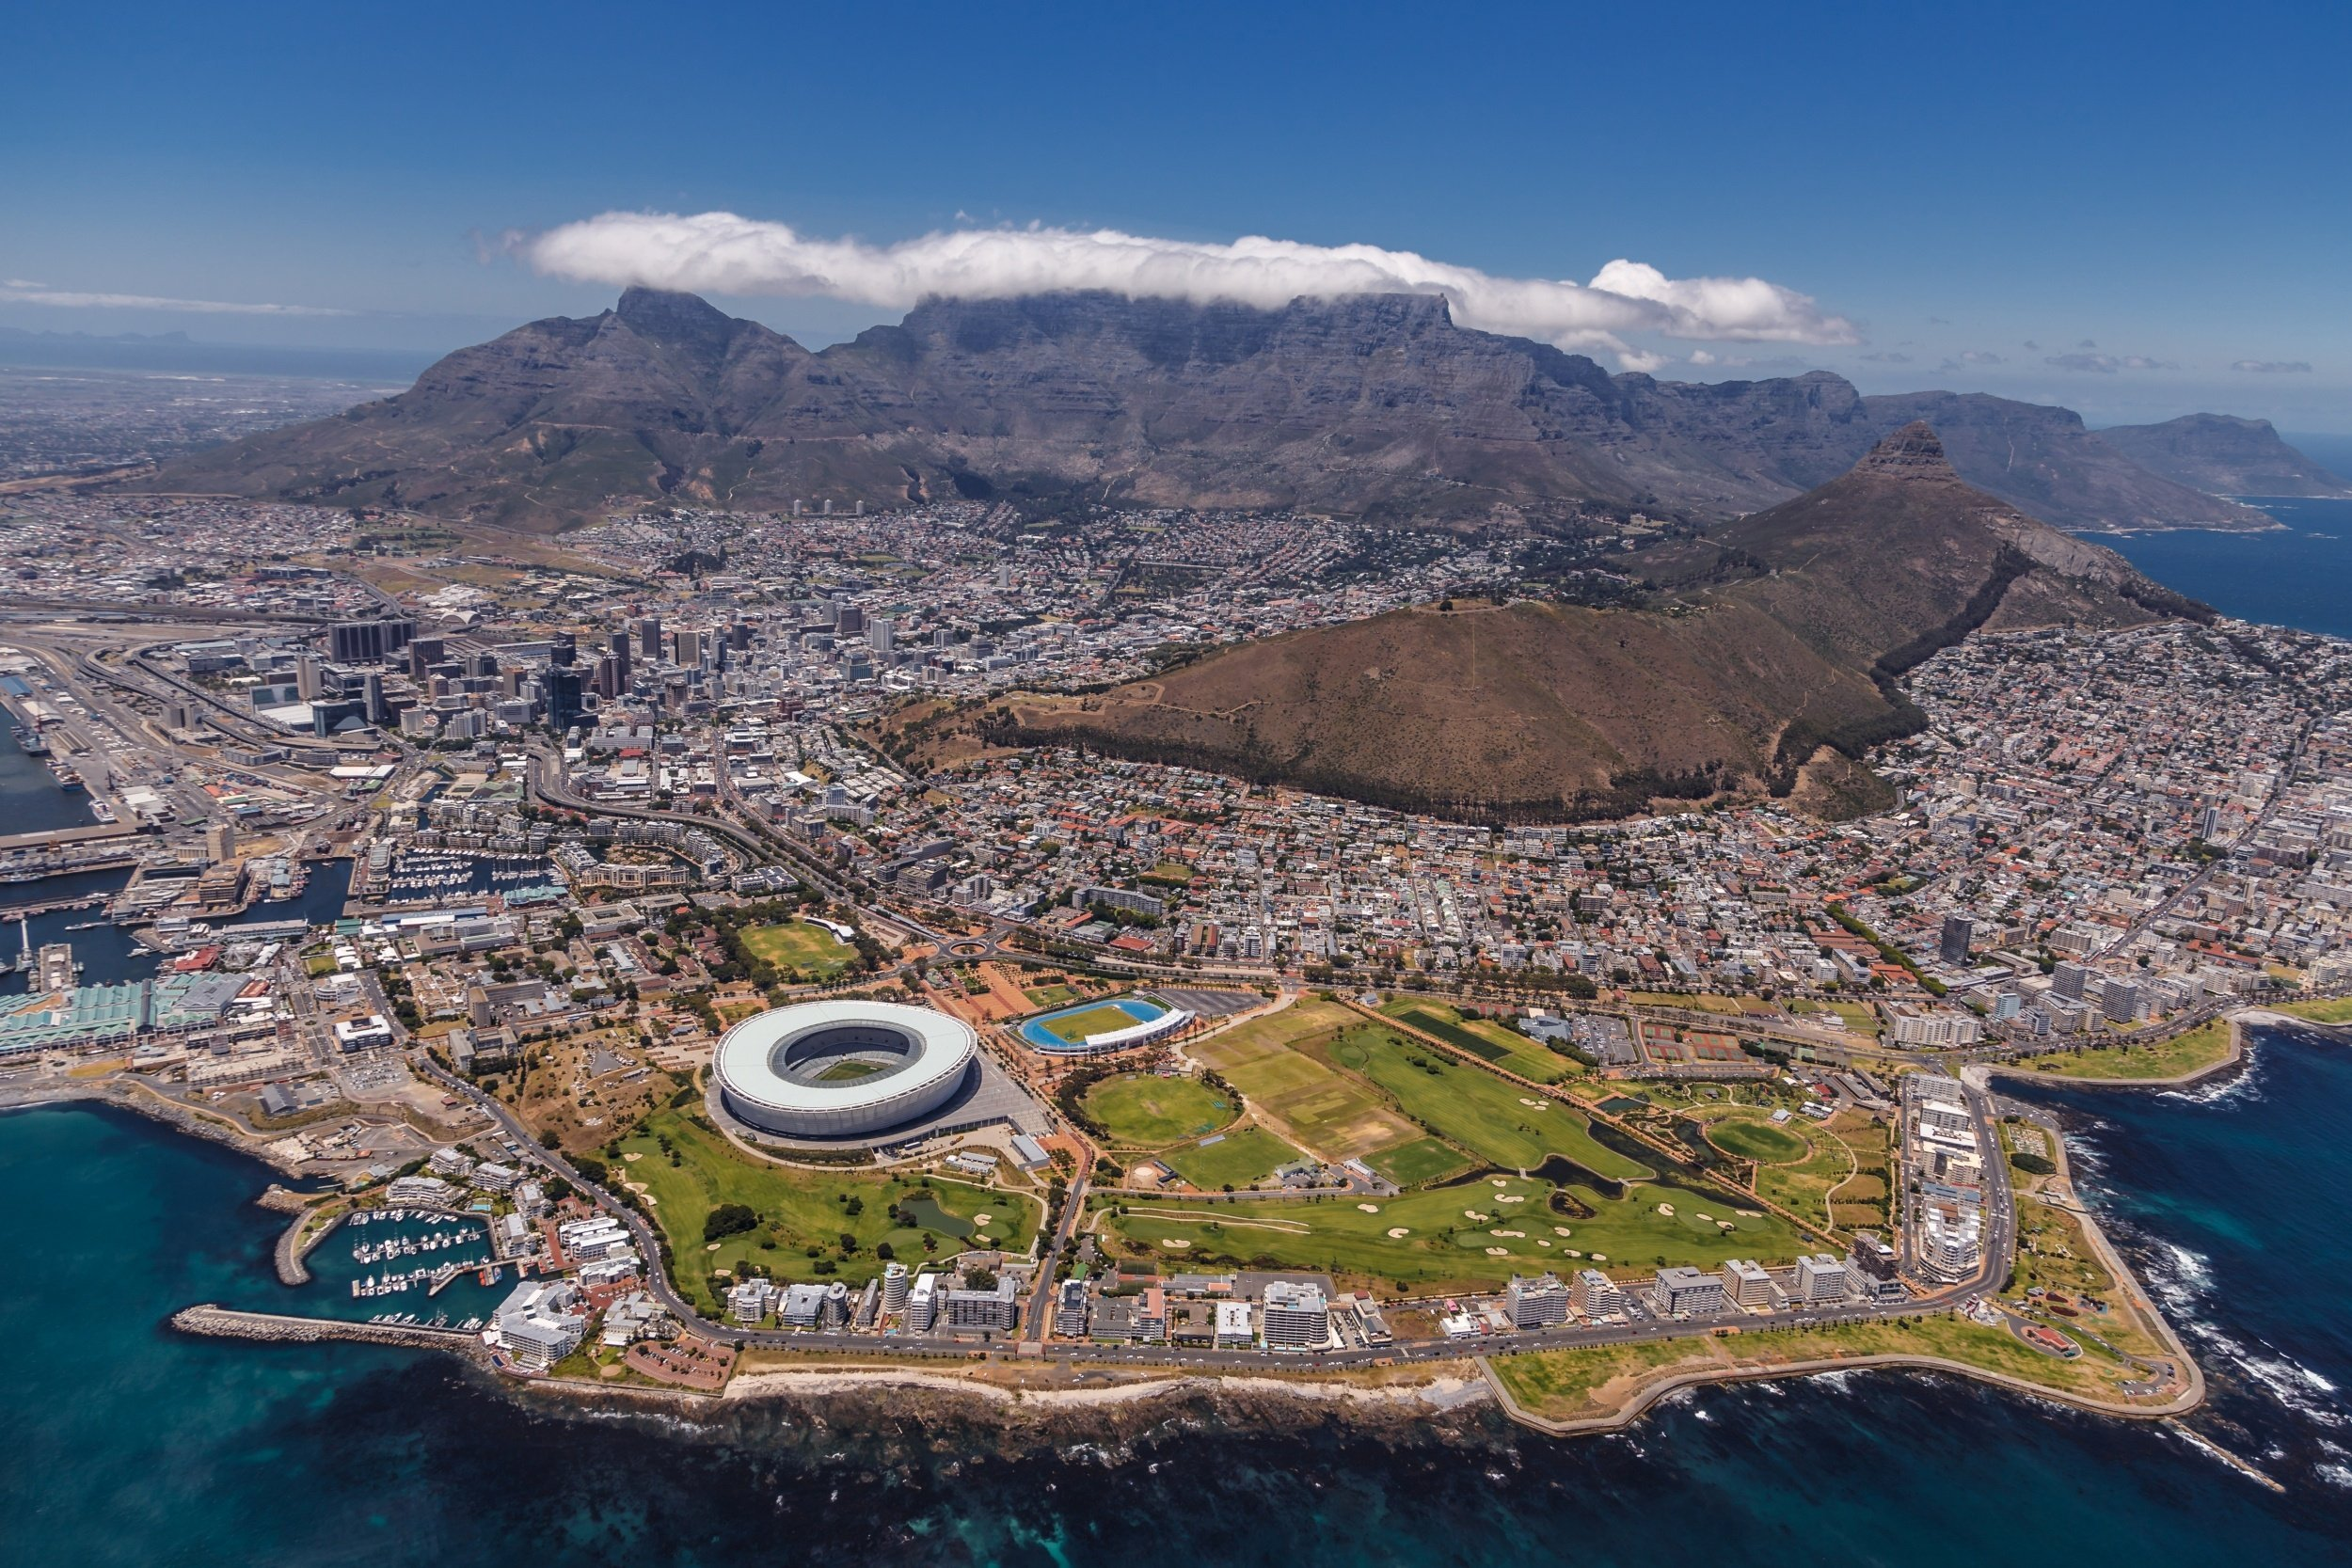 cape town wallpaper hd,aerial photography,bird's eye view,natural landscape,island,artificial island